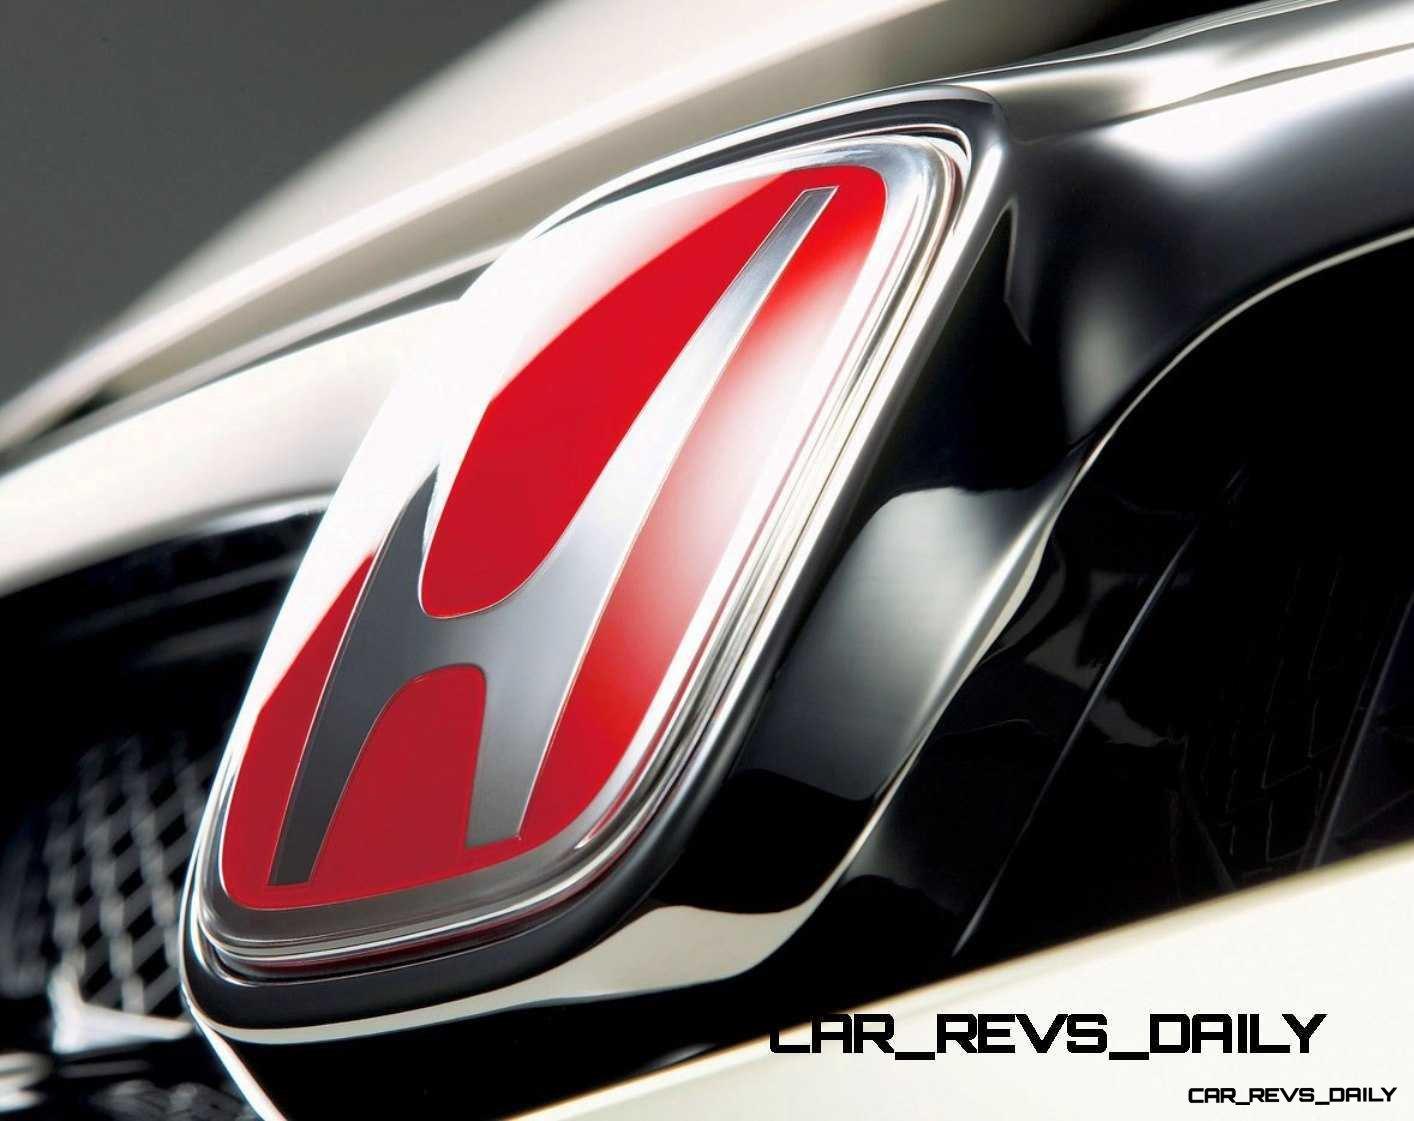 Cool! 2015 Honda Vezel Hybrid Previews Spring 2014 Civic CUV1